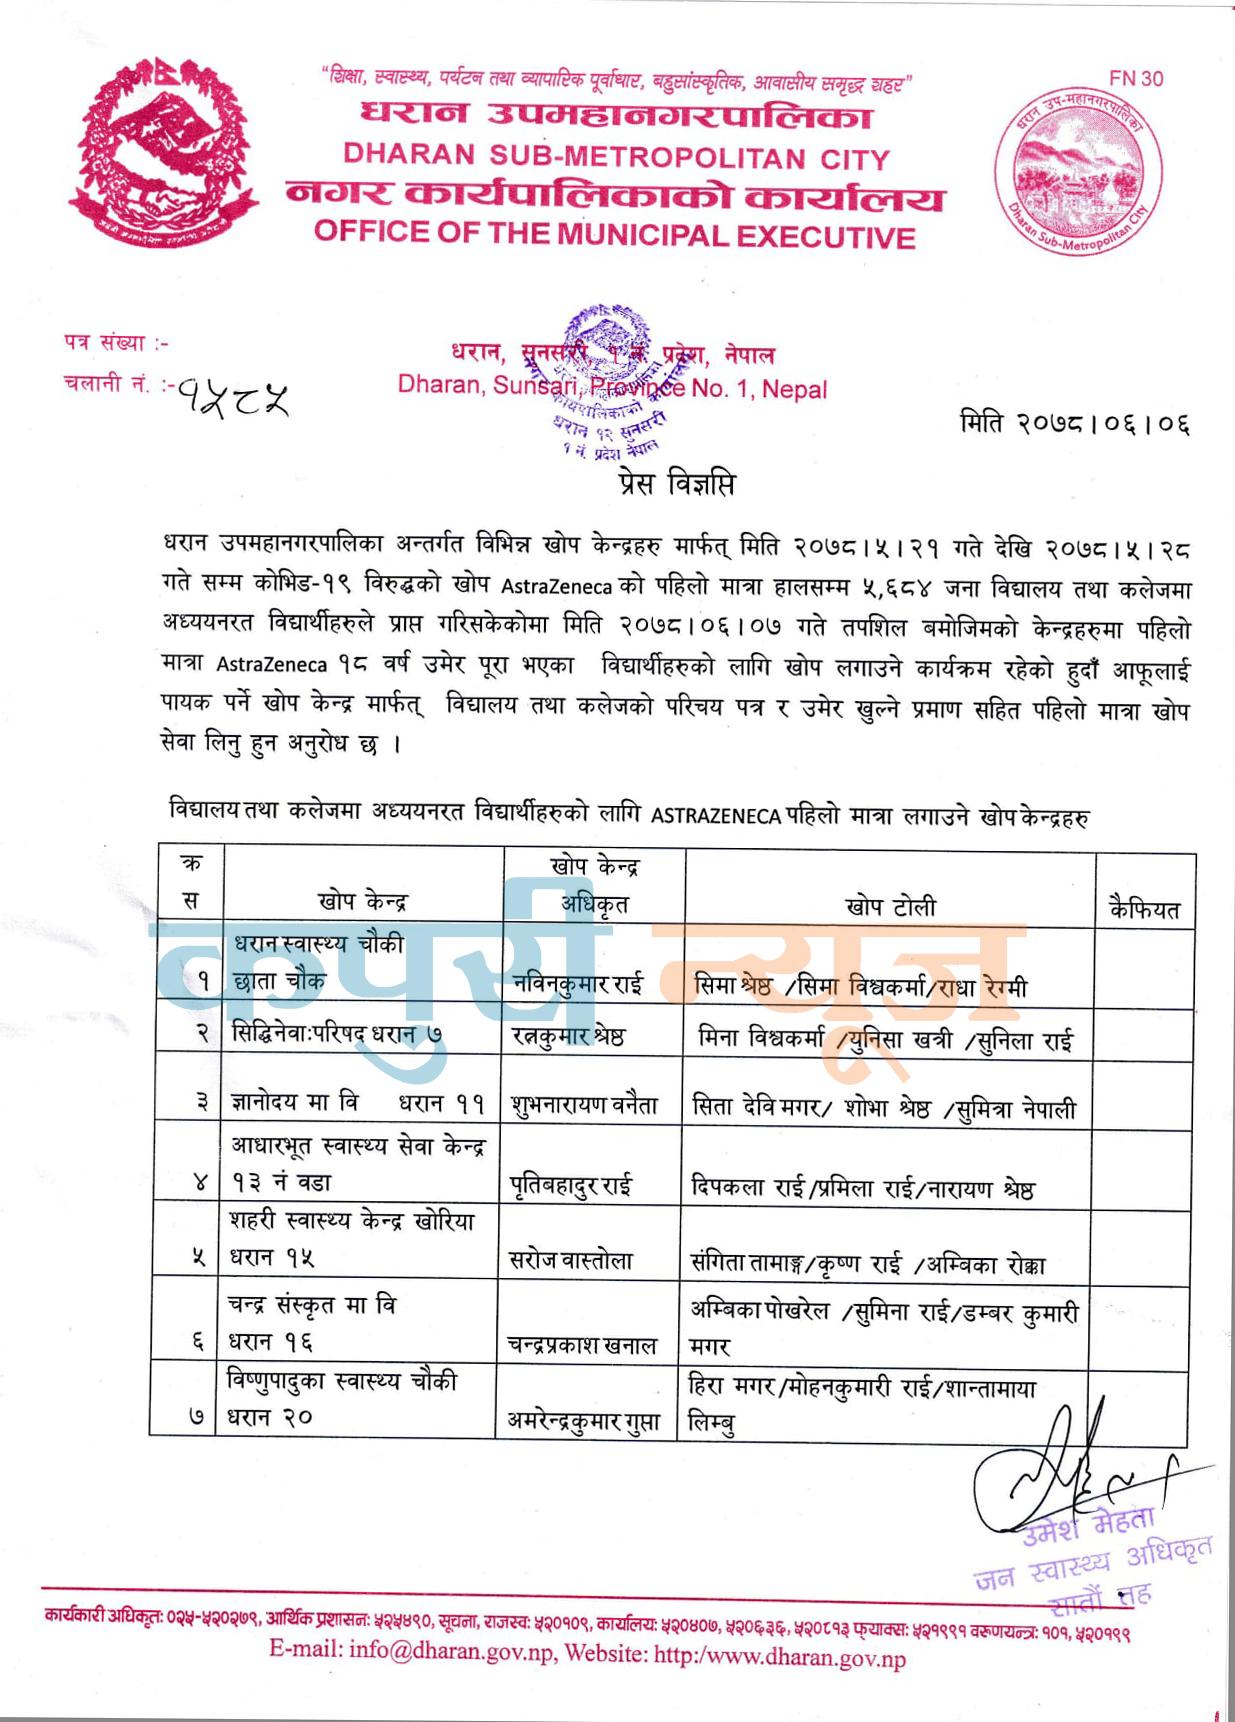 student-khop-dharan